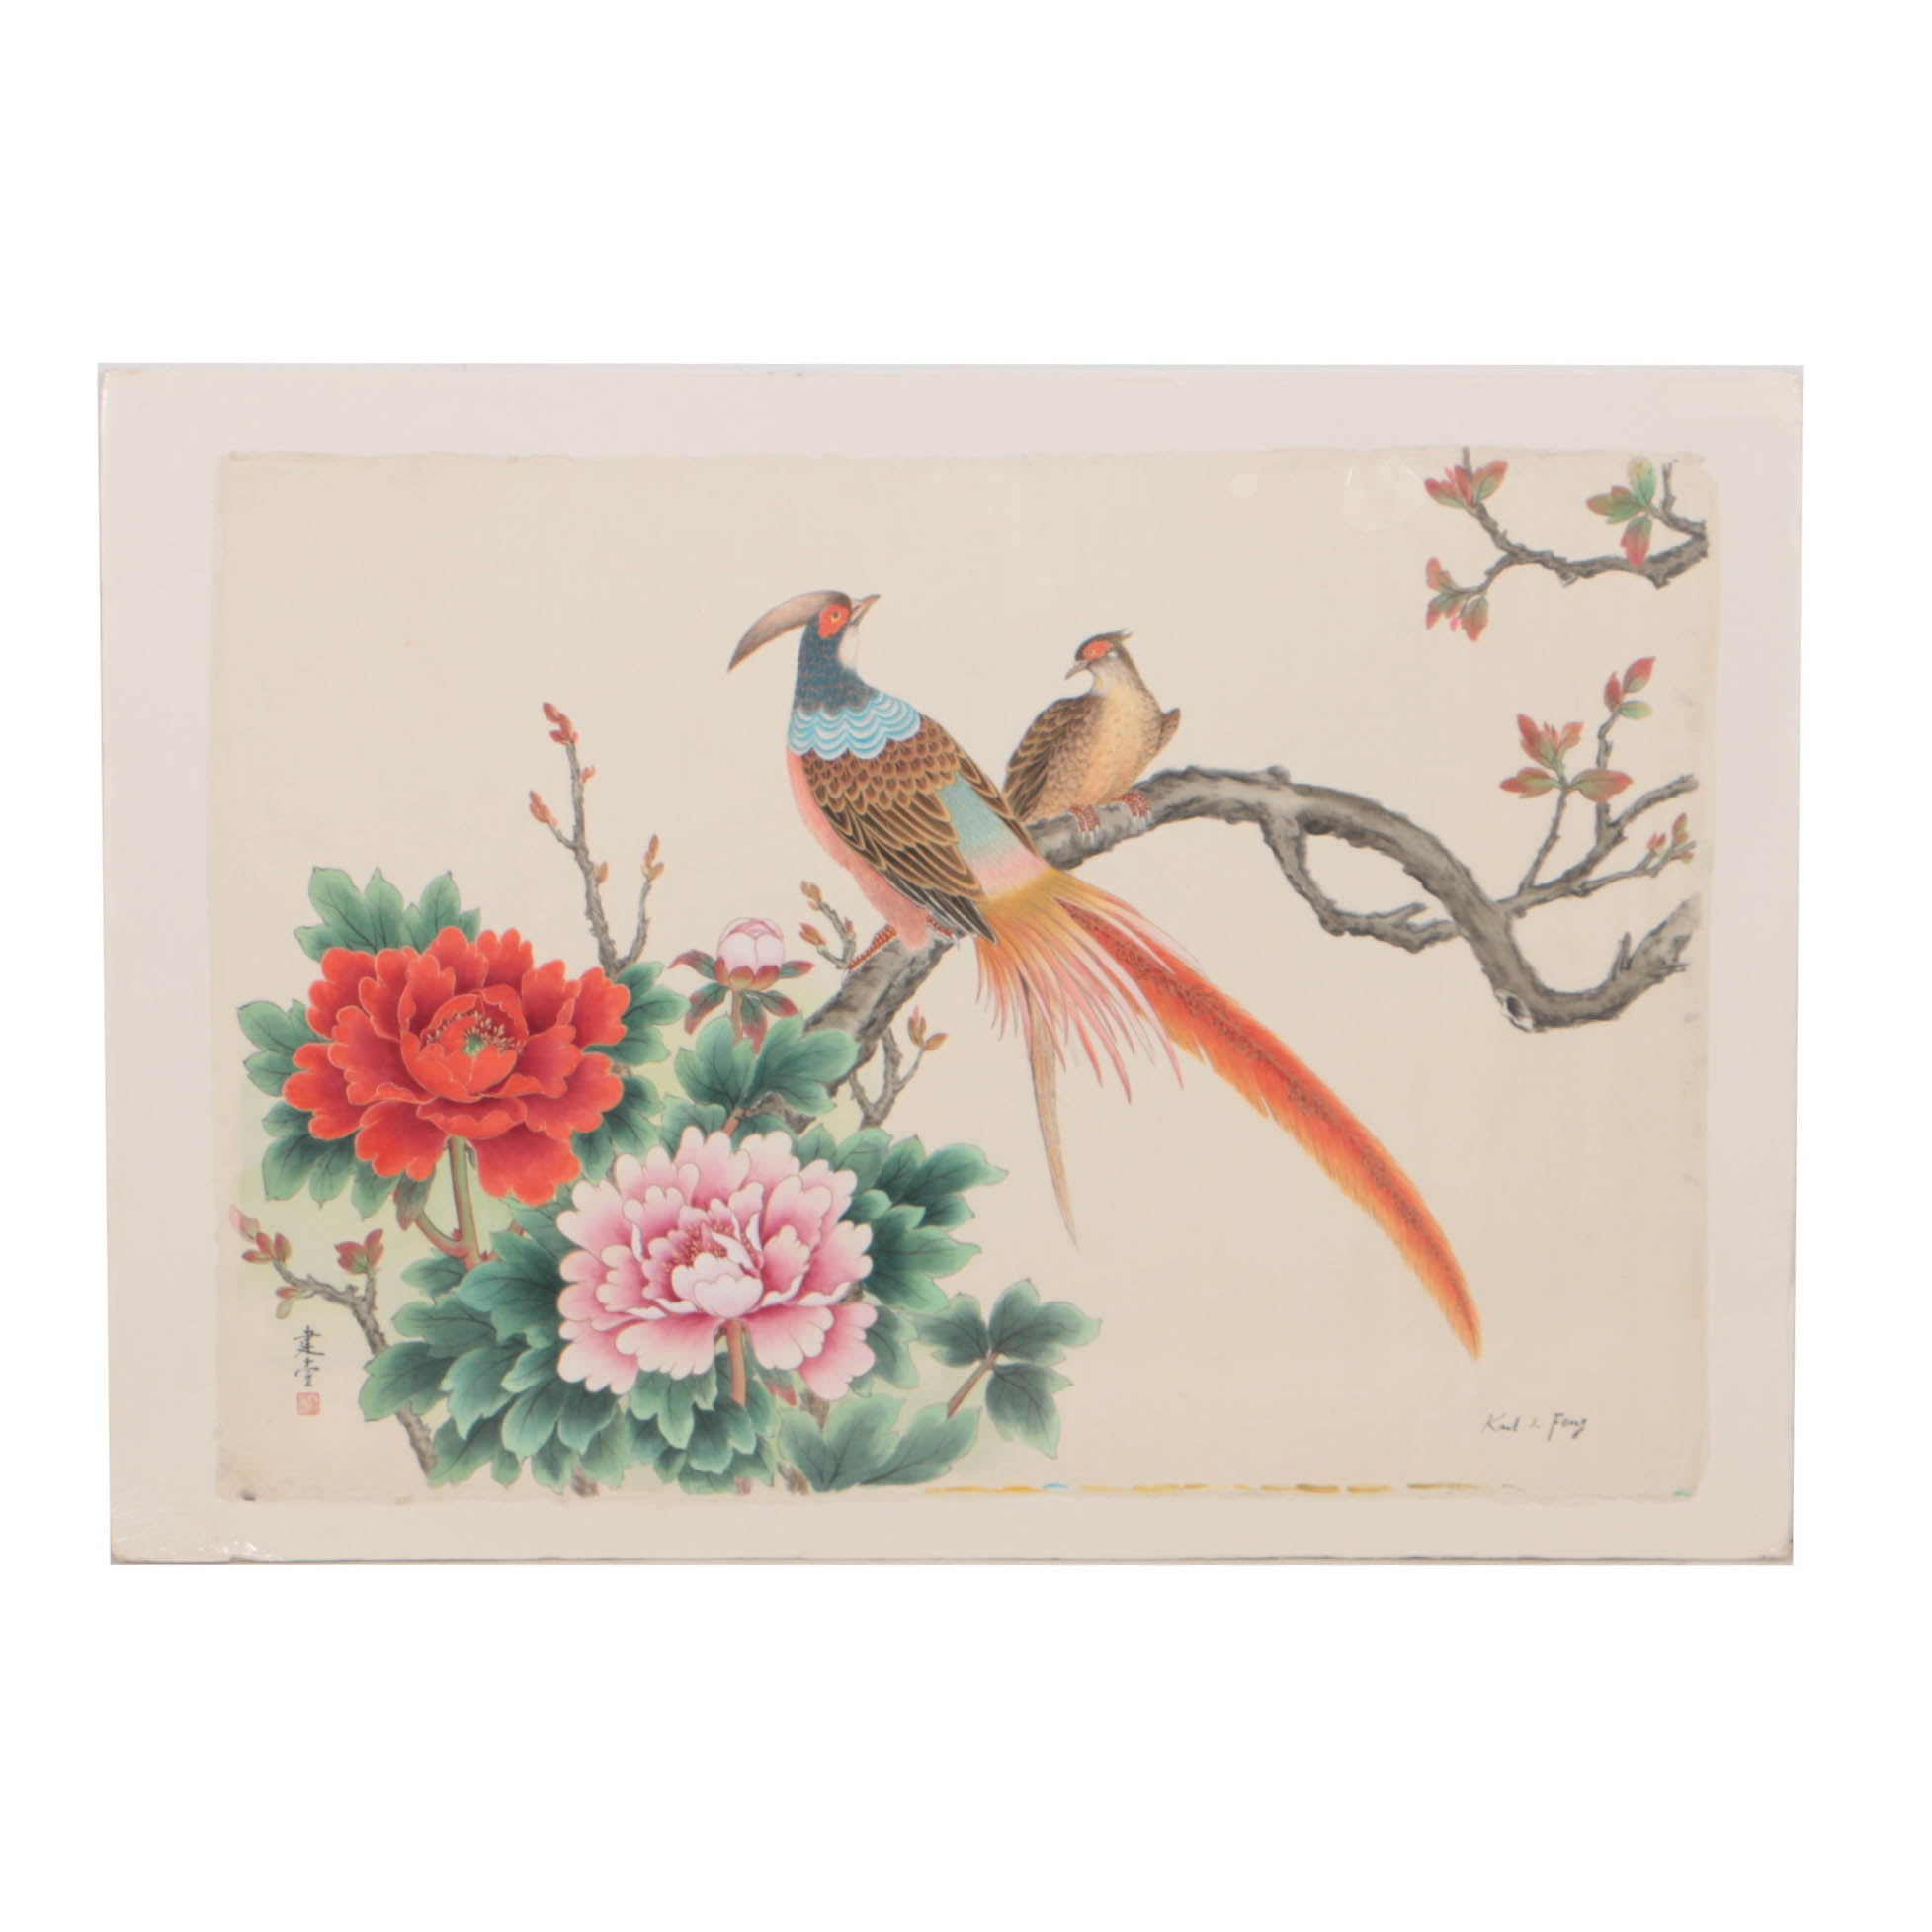 Karl J. Feng Watercolor Painting on Fabric of Pheasants